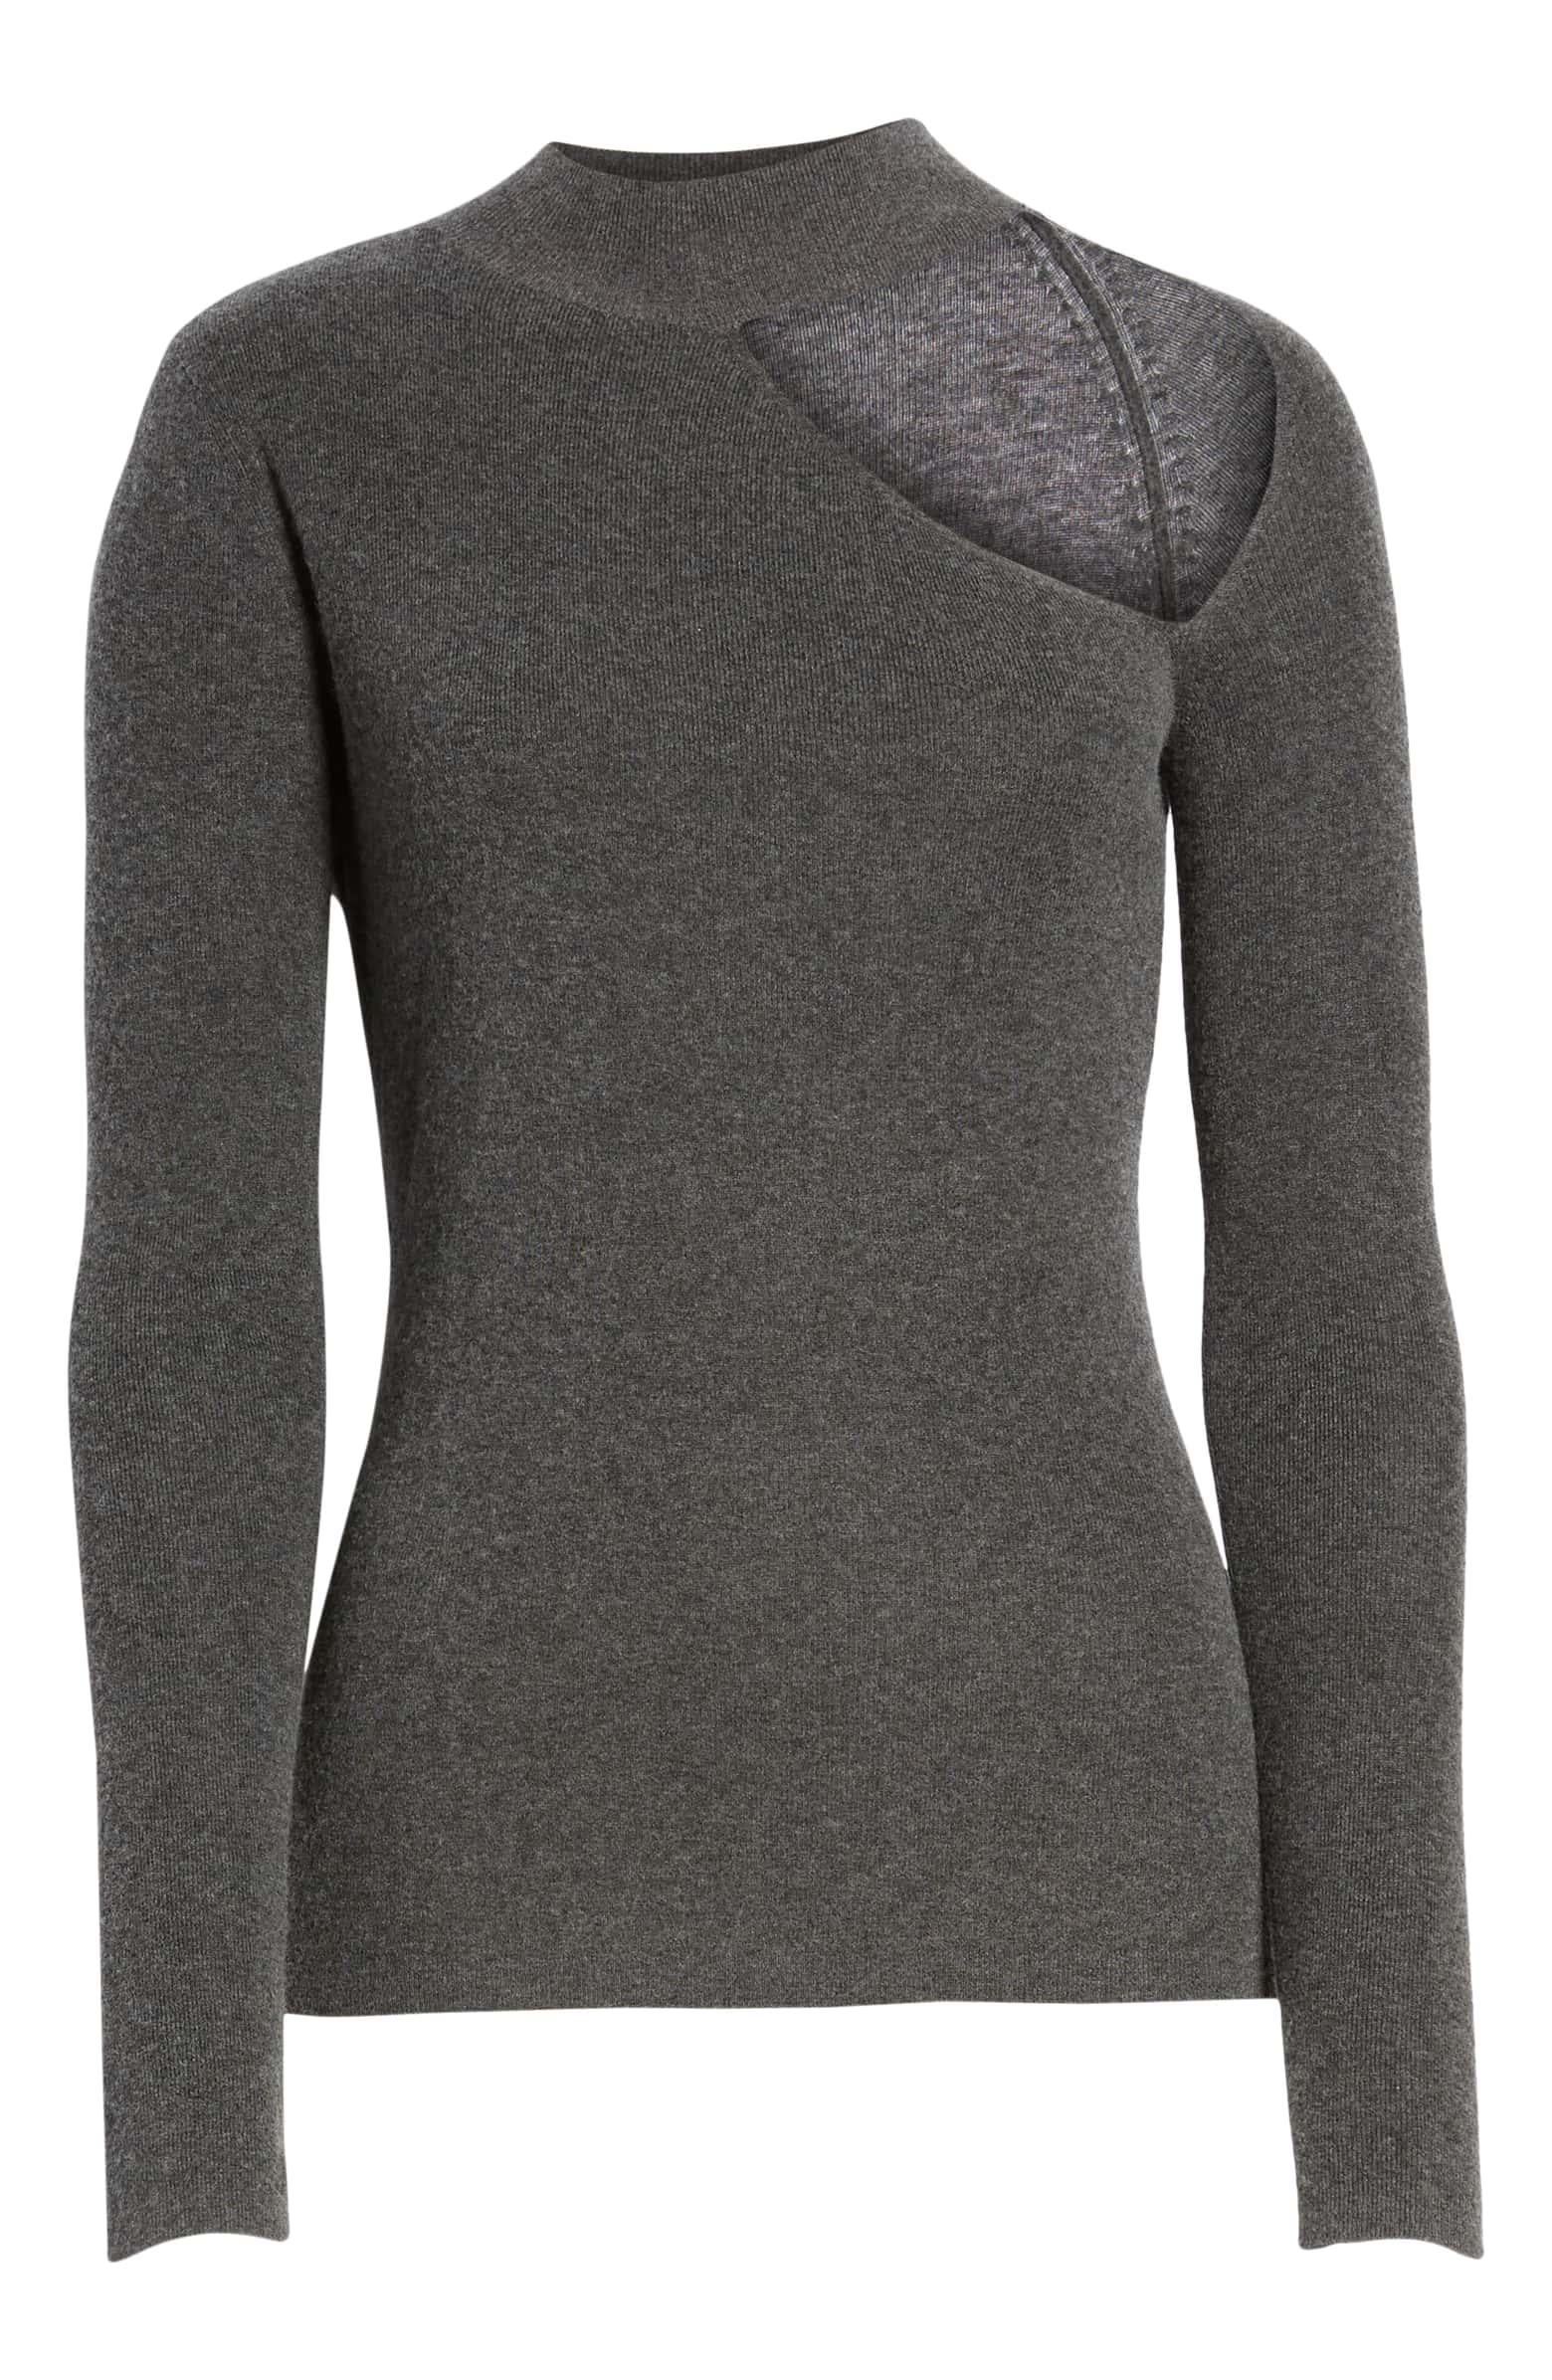 BAILEY 44 Svetlana Choker Sweater, $168